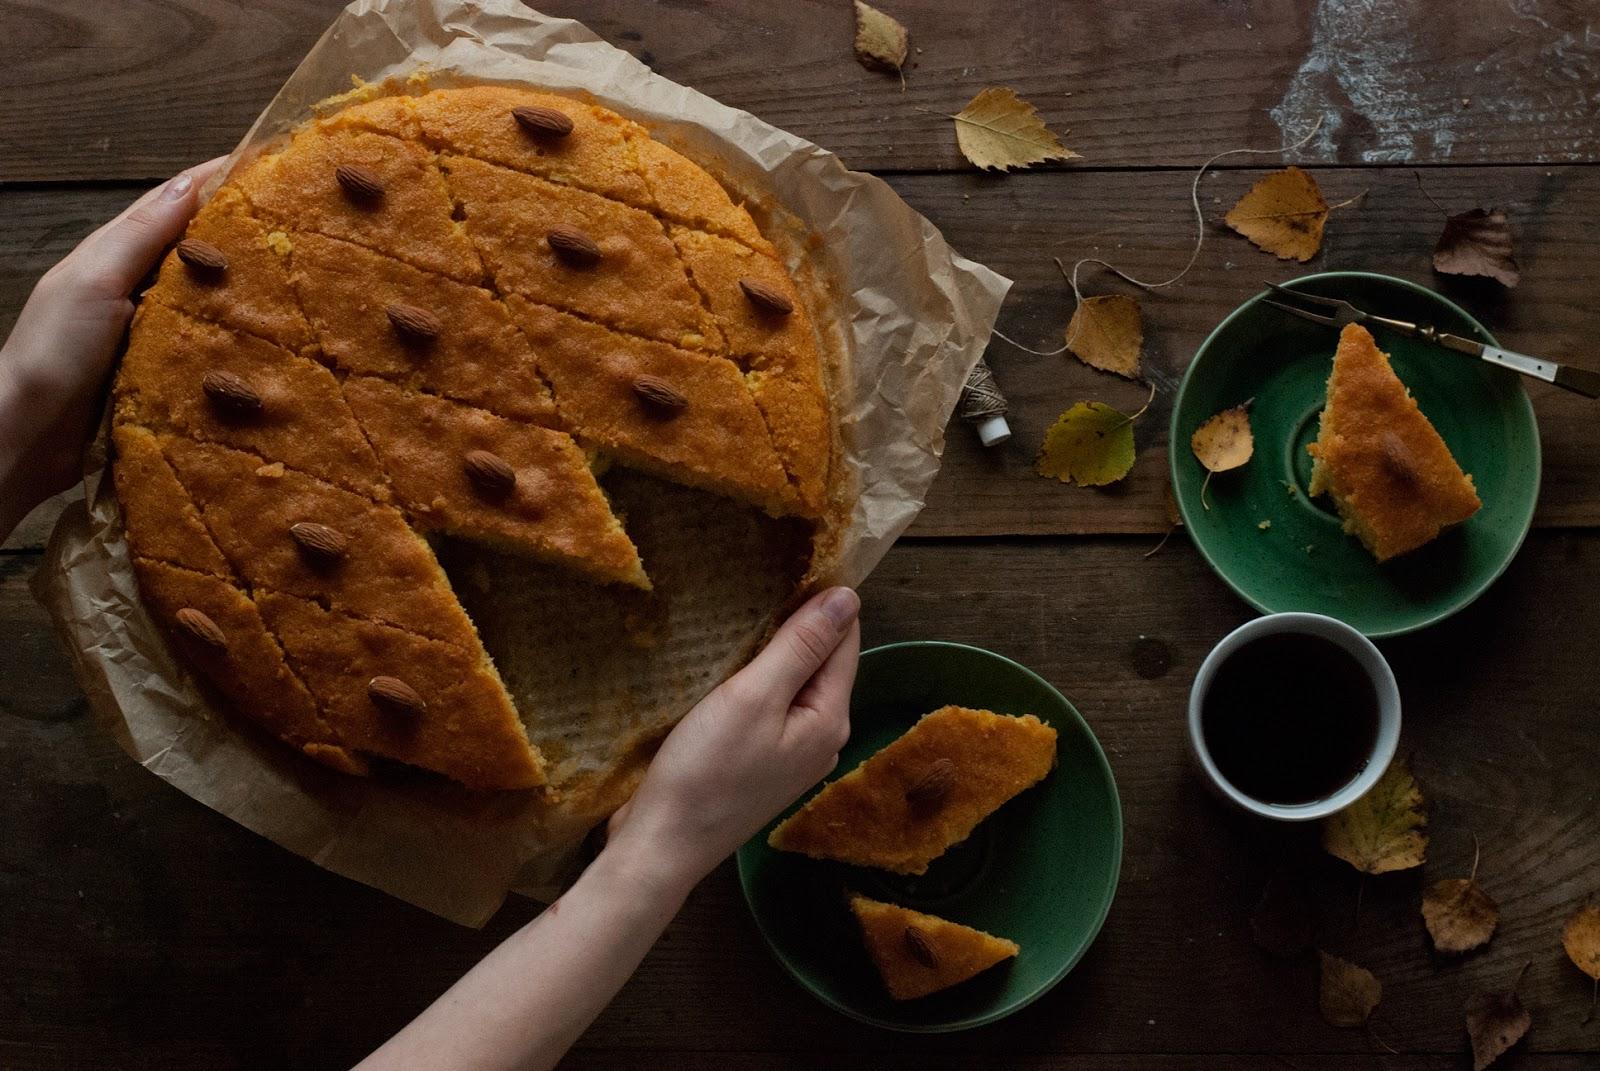 Tureckie ciasto Revani bez glutenu